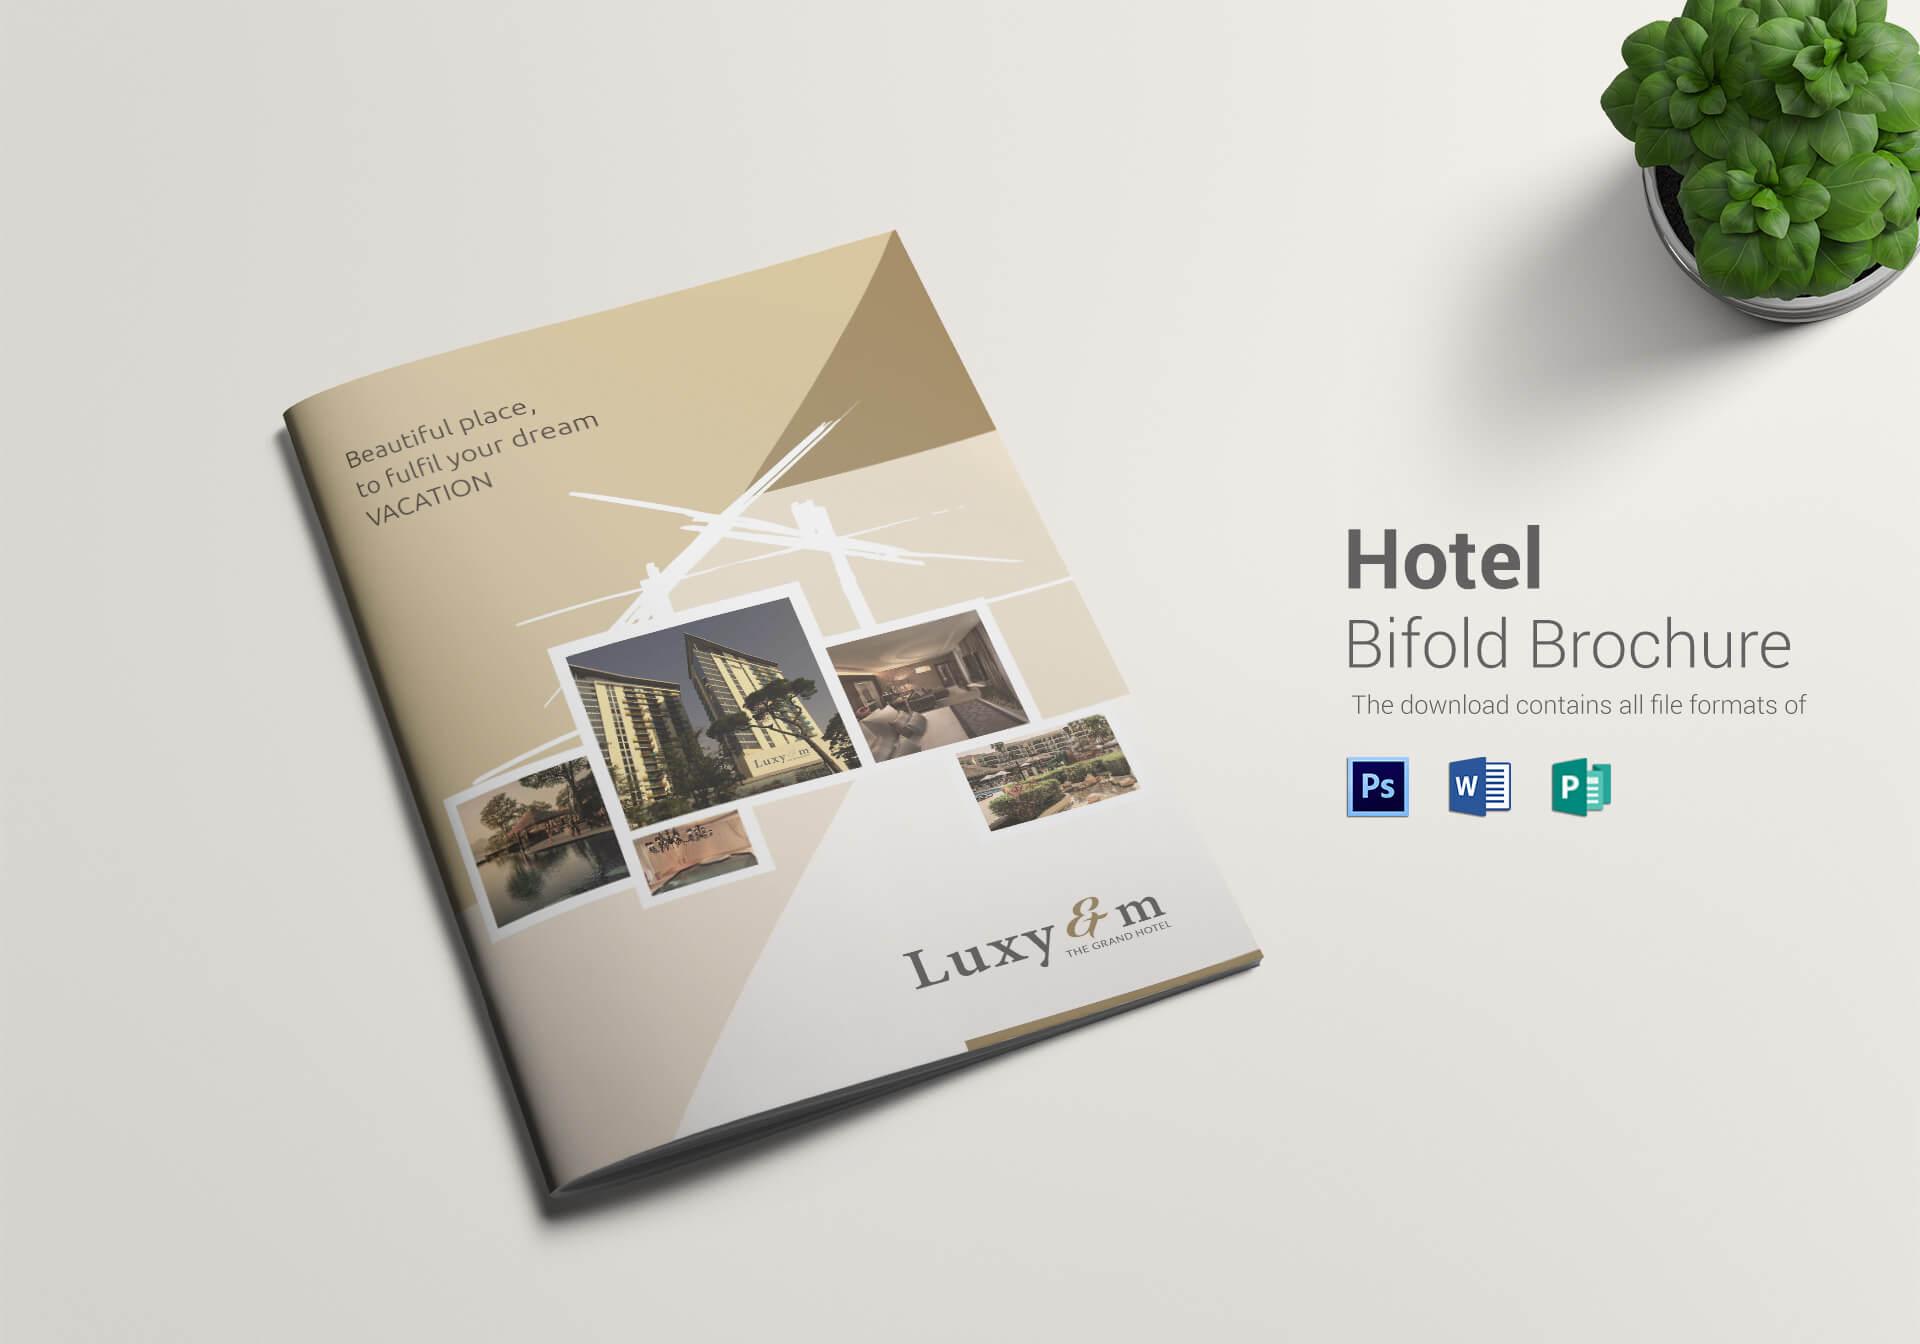 Hotel Bi Fold Brochure Template For Hotel Brochure Design Templates